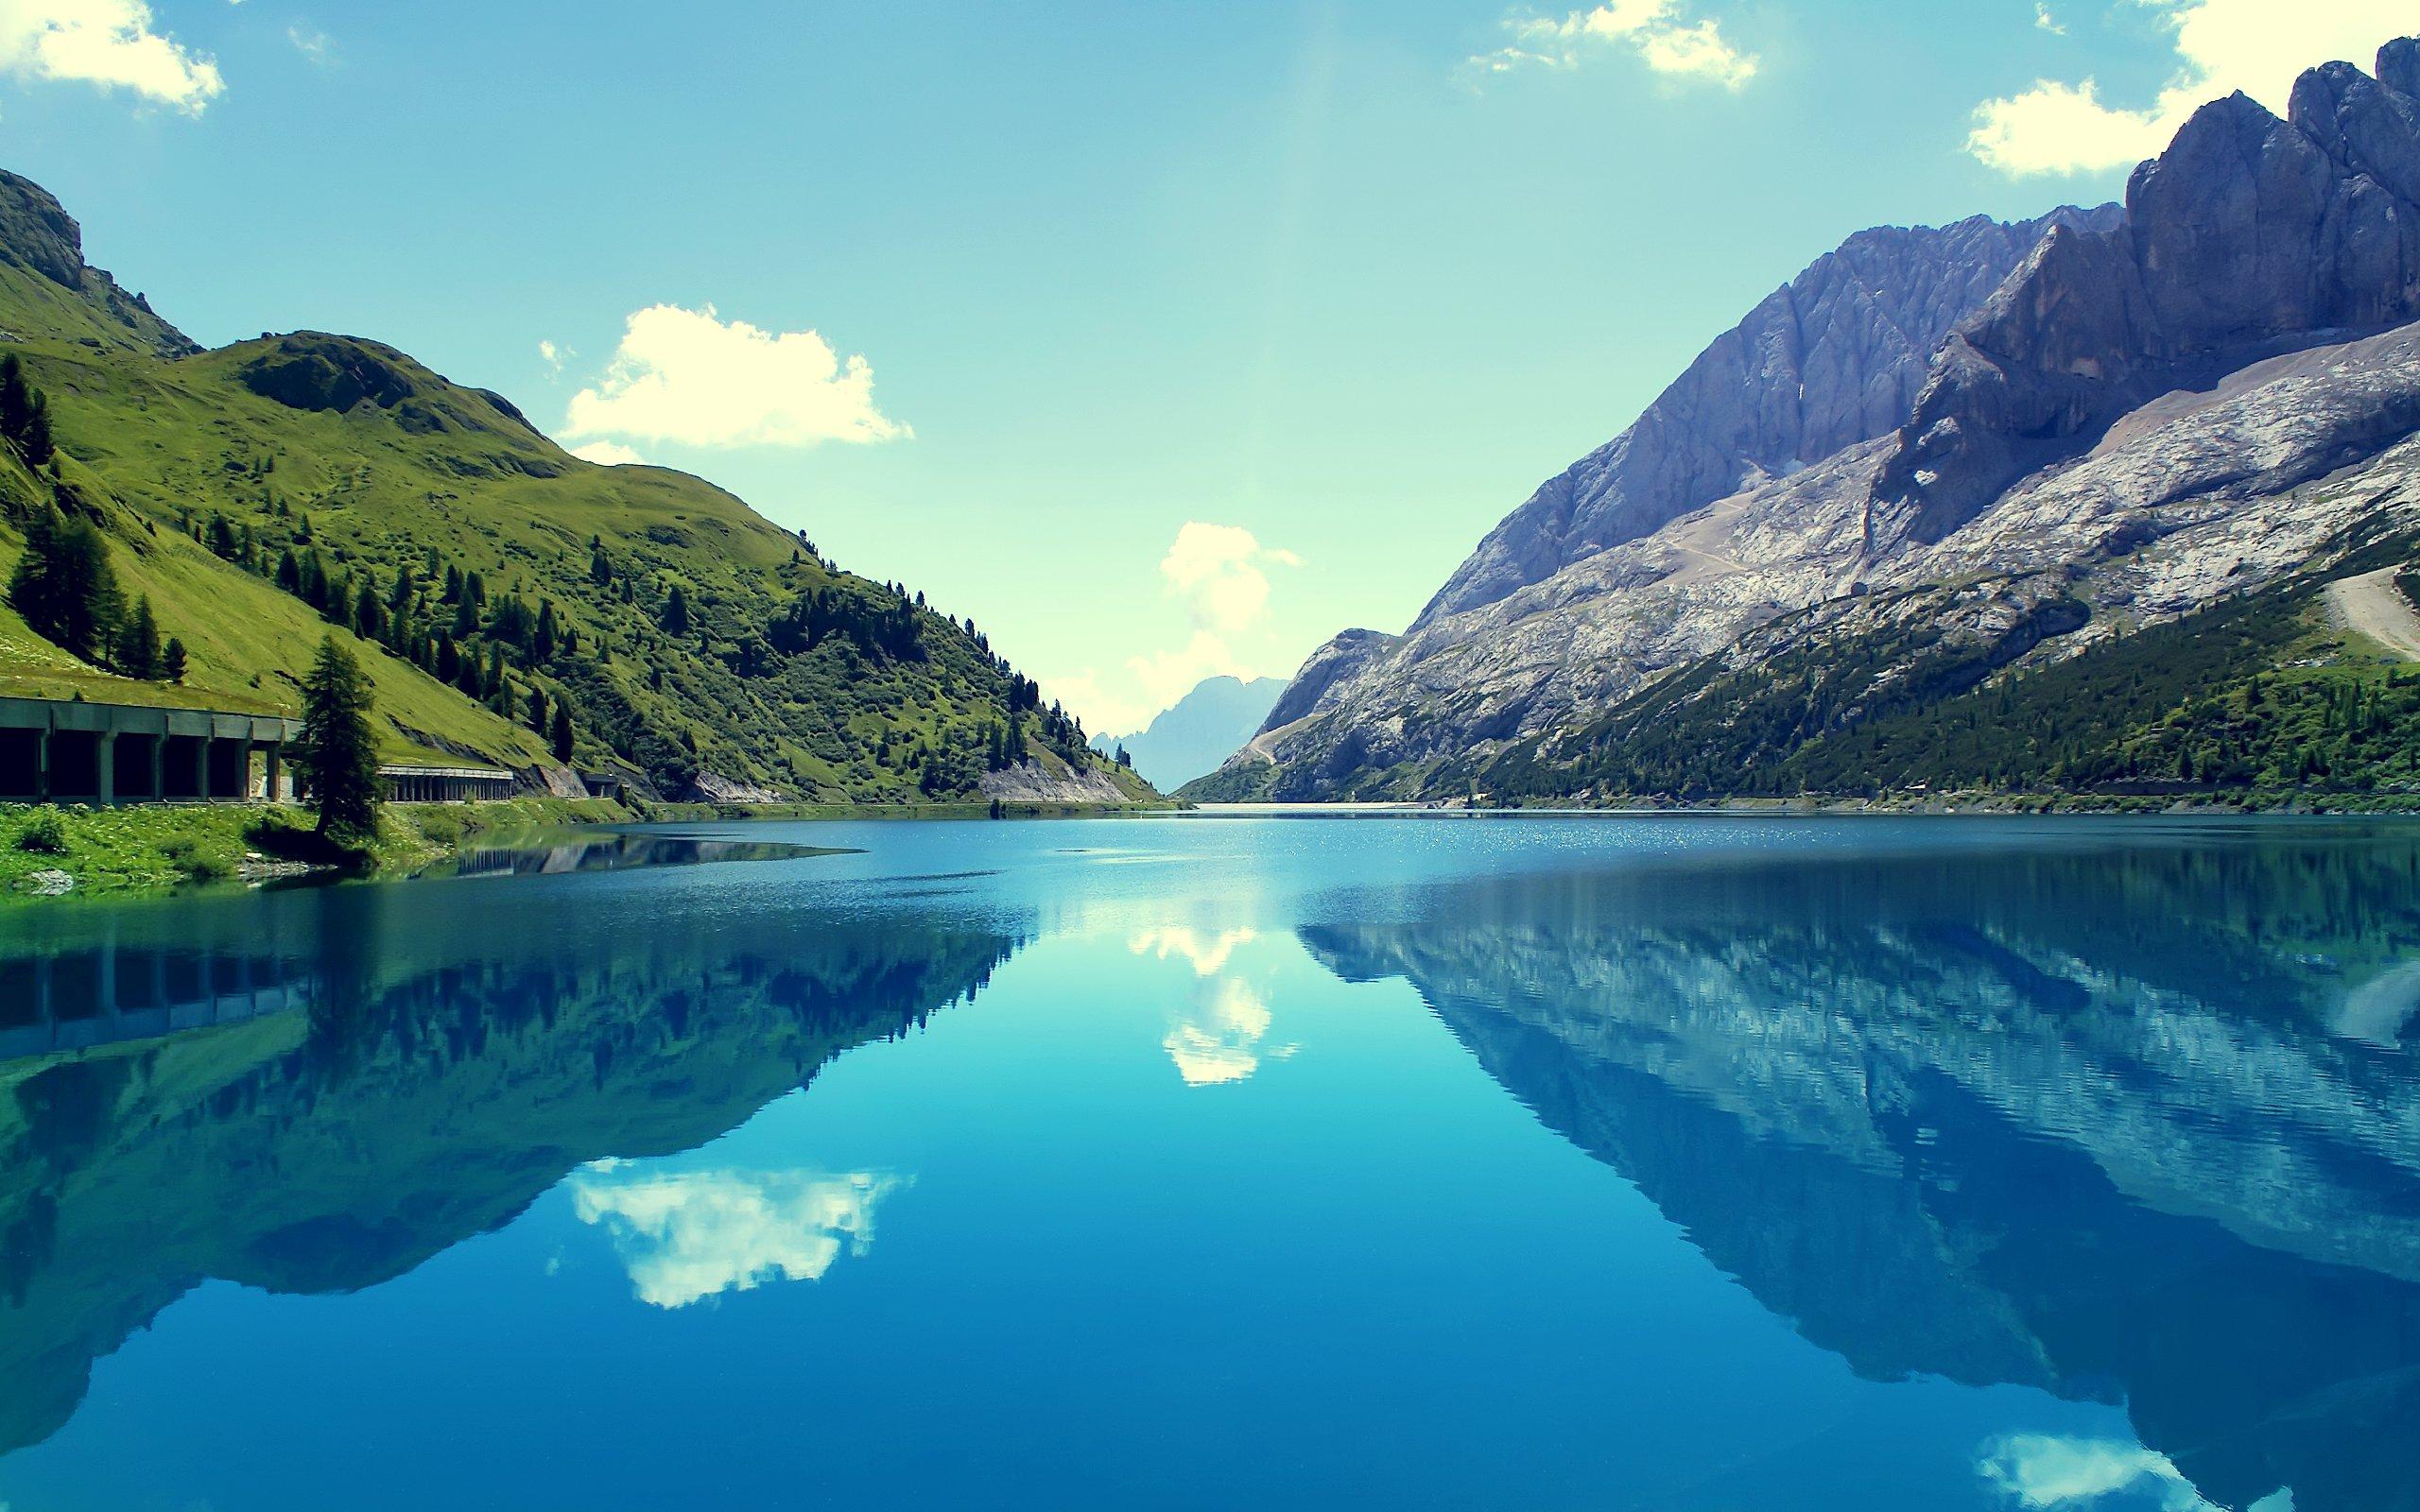 nature wallpaper,body of water,natural landscape,nature,reflection,mountainous landforms